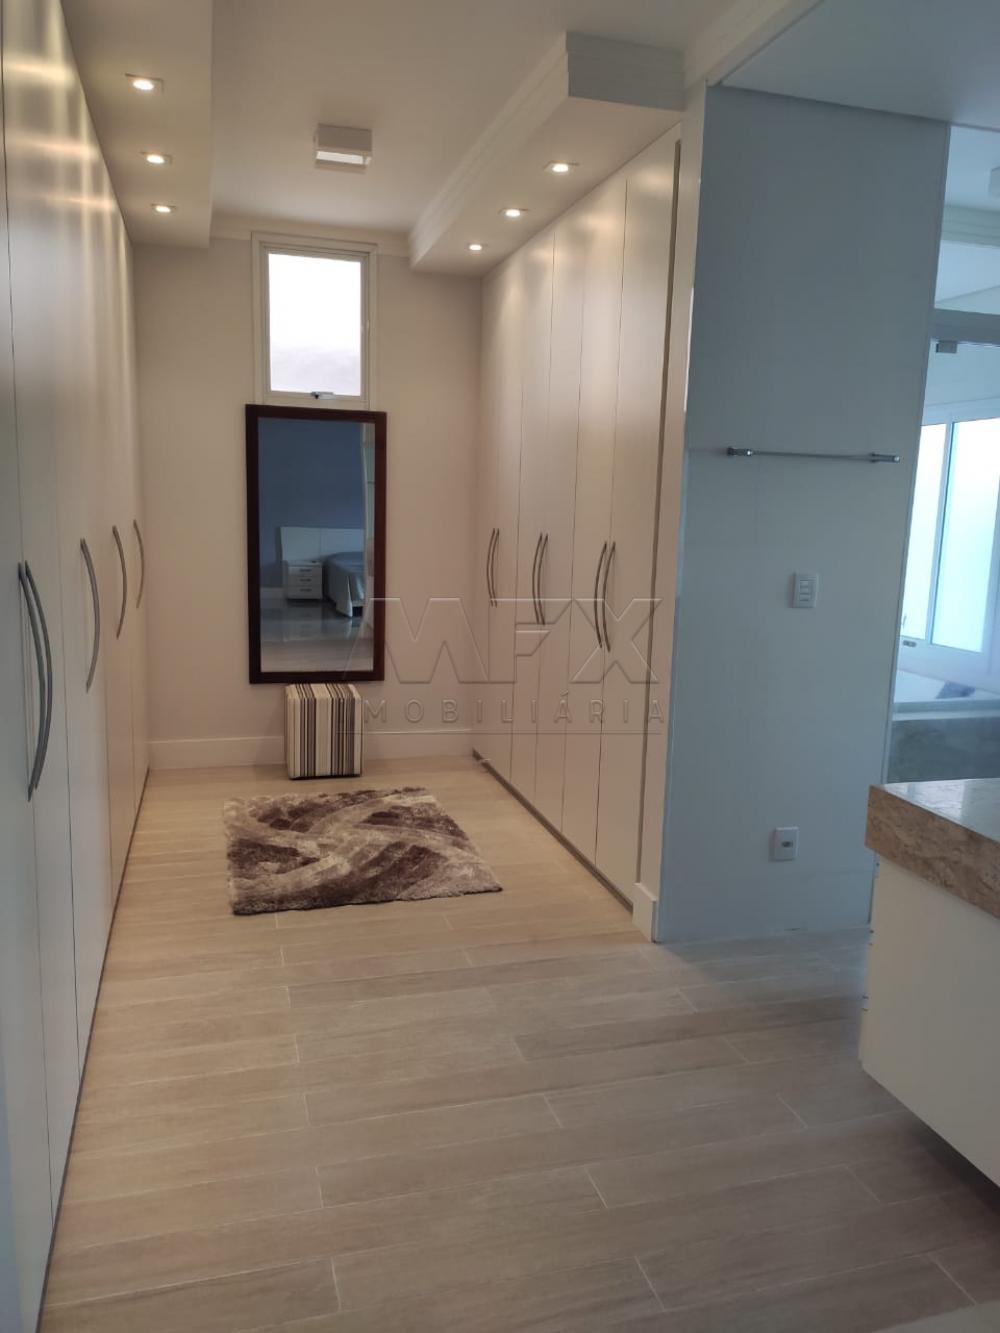 Comprar Casa / Condomínio em Bauru apenas R$ 1.800.000,00 - Foto 25